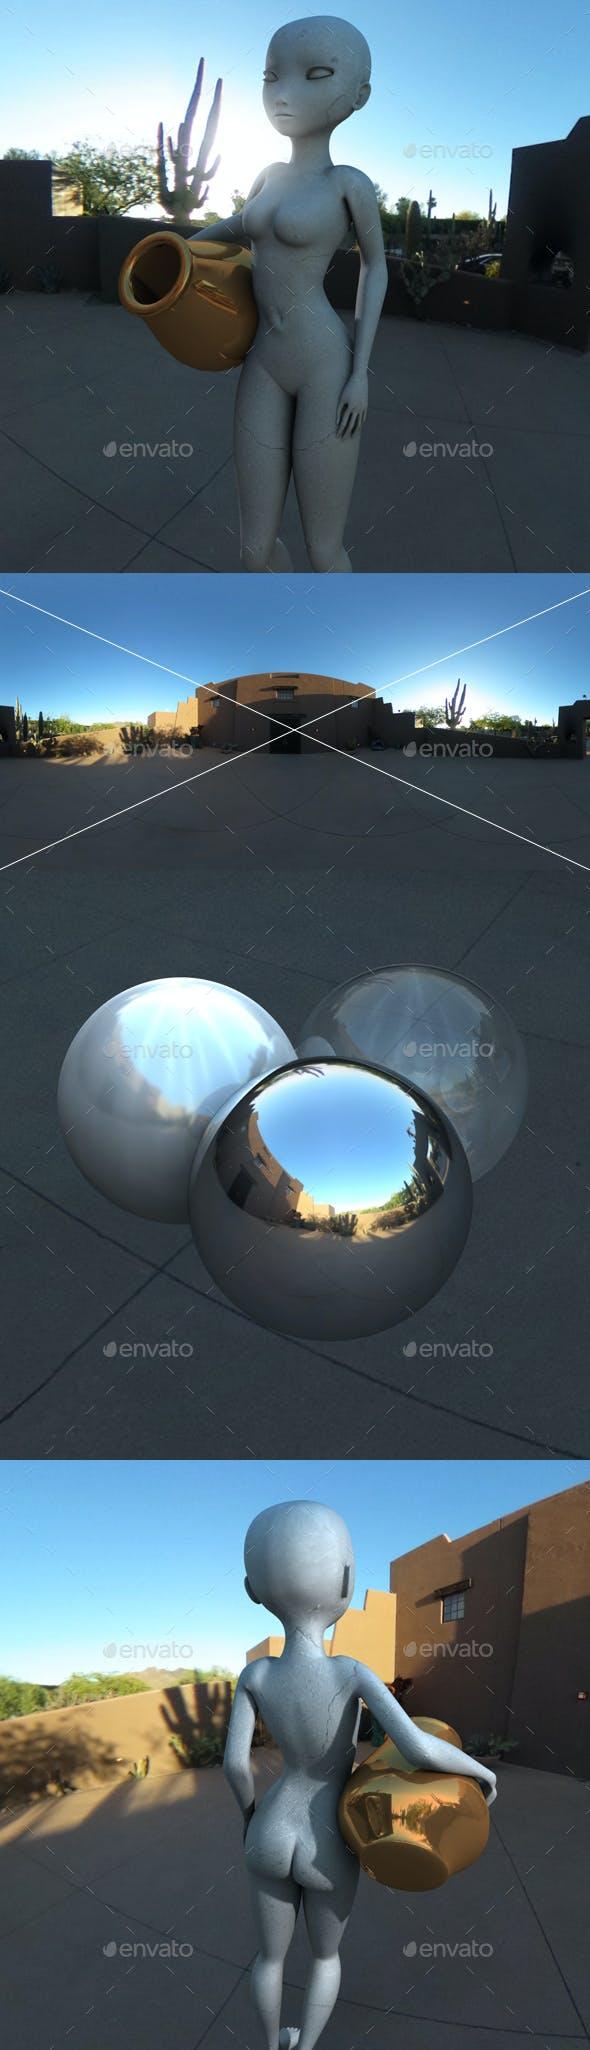 Desert Courtyard HDRI - 3DOcean Item for Sale